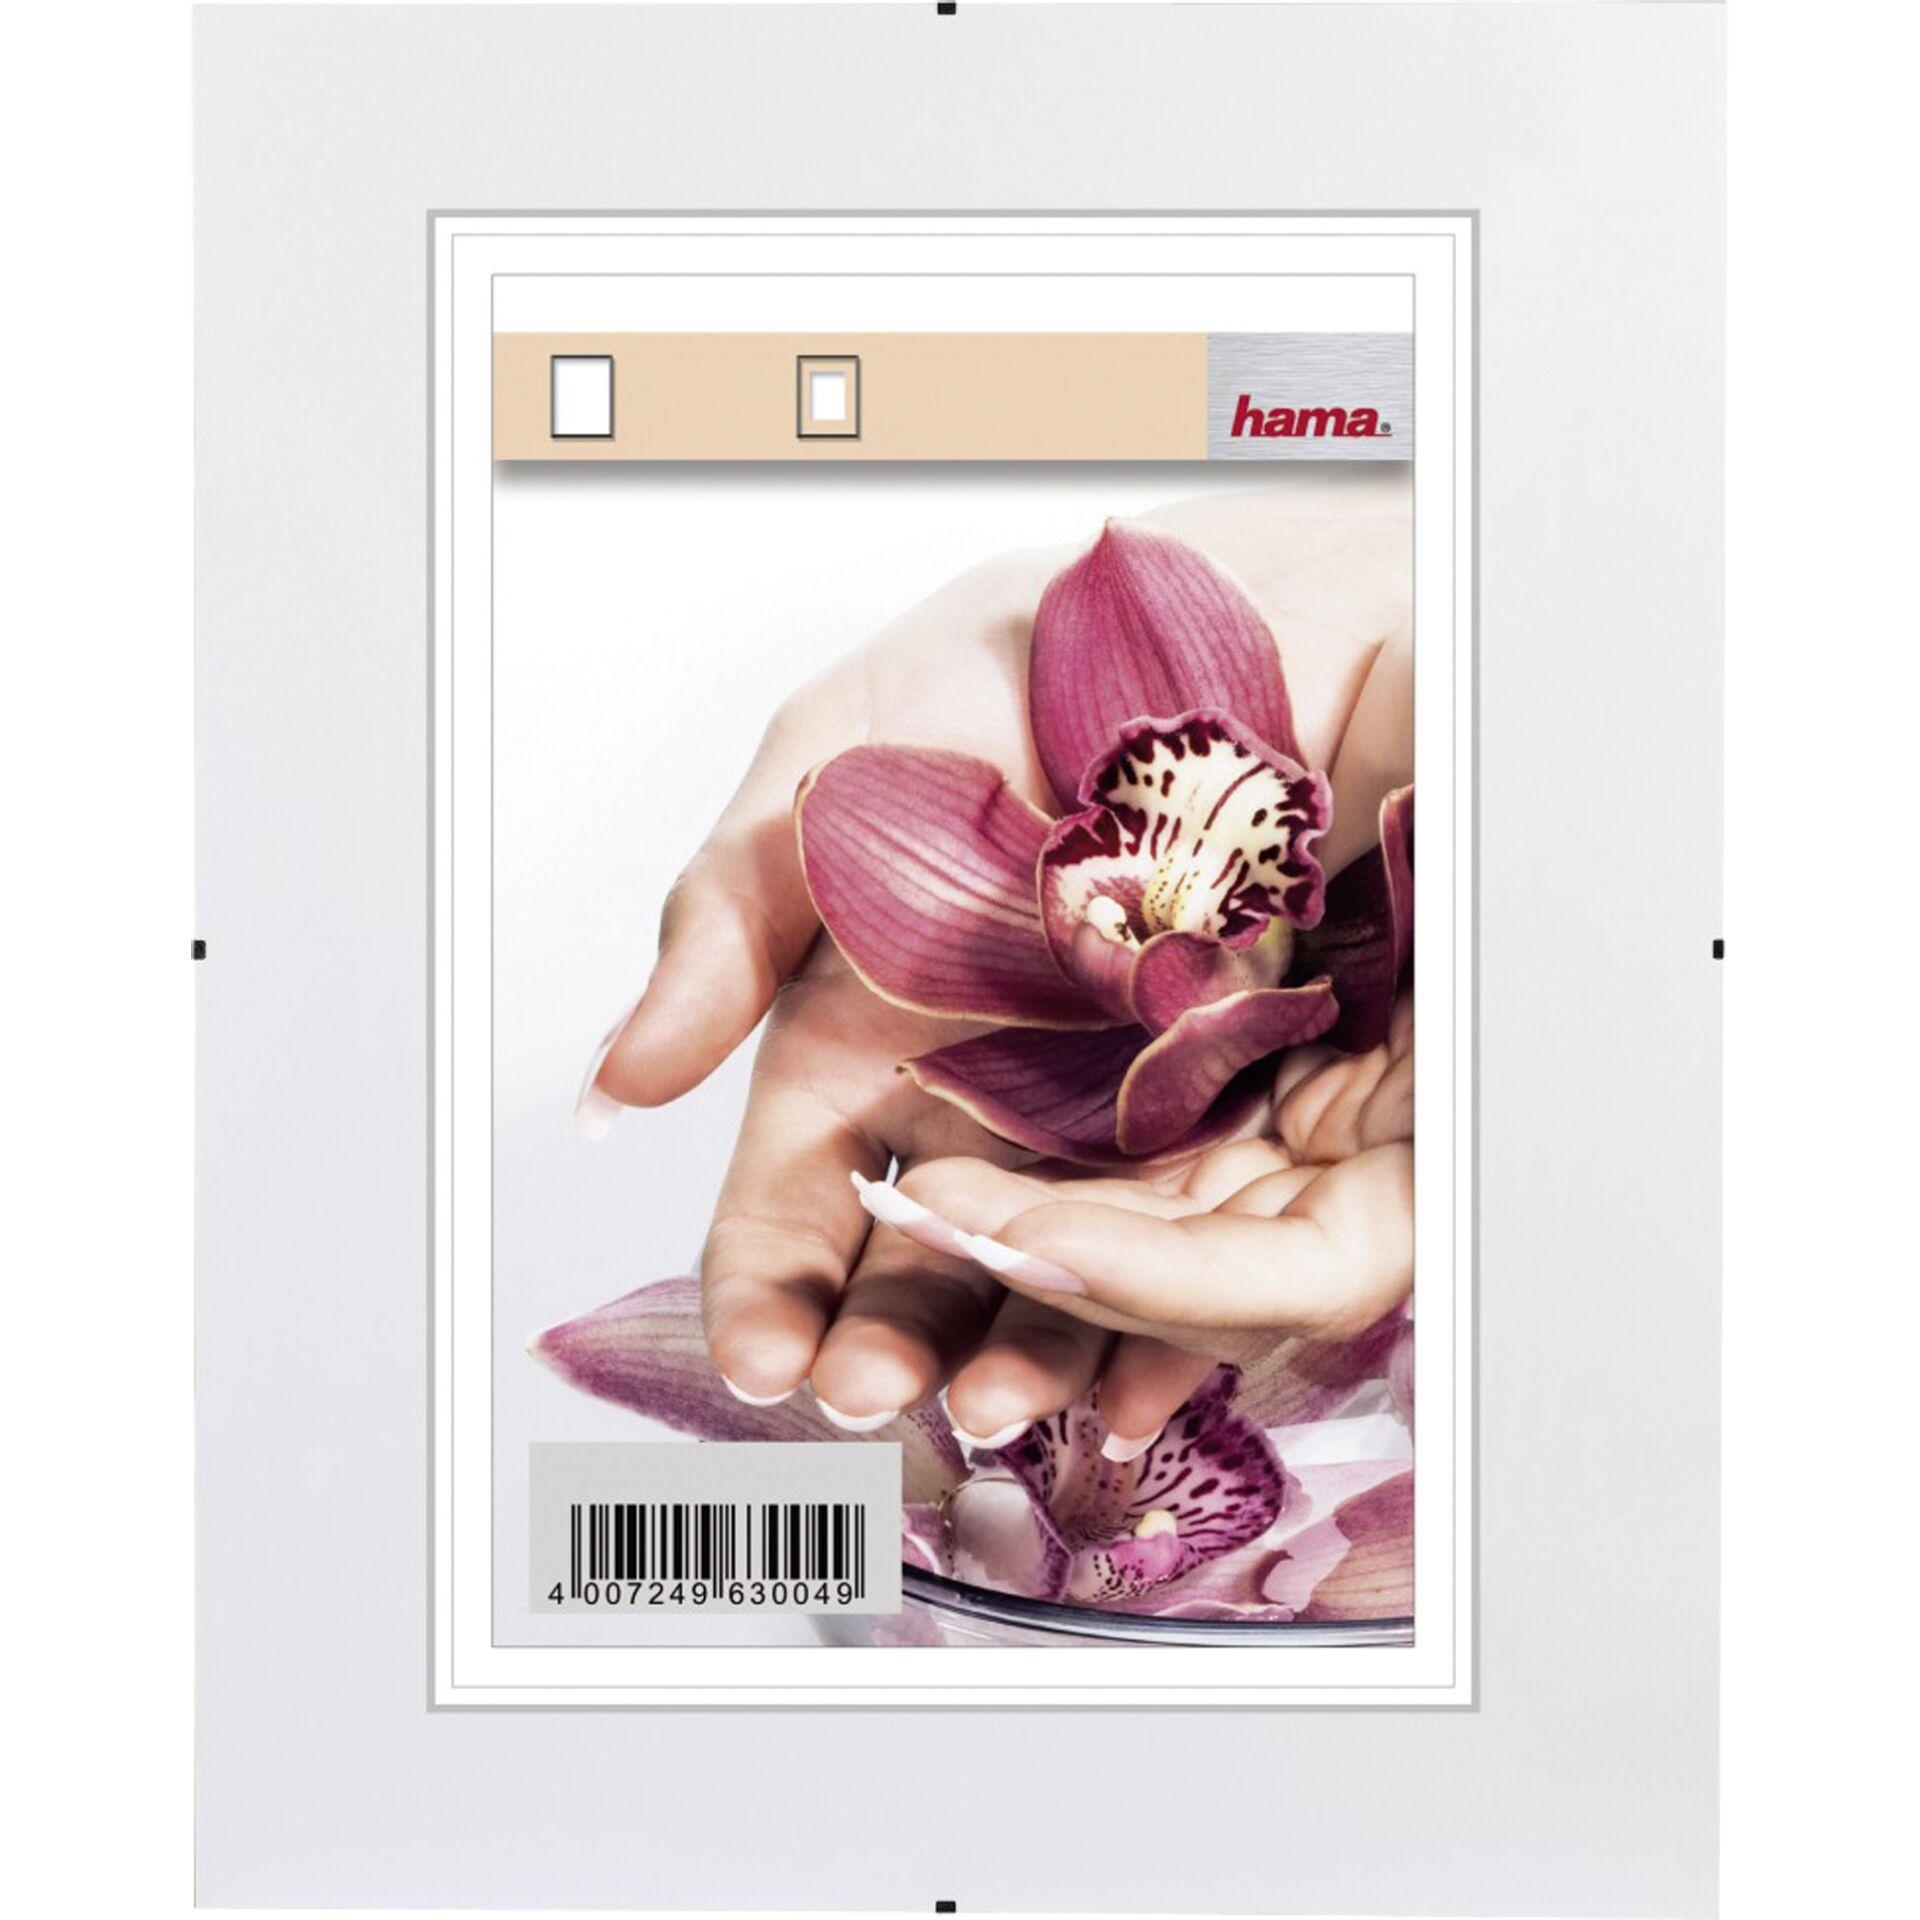 Hama Clip-Fix NG           20x30 rahmenloser Bildhalter     63018